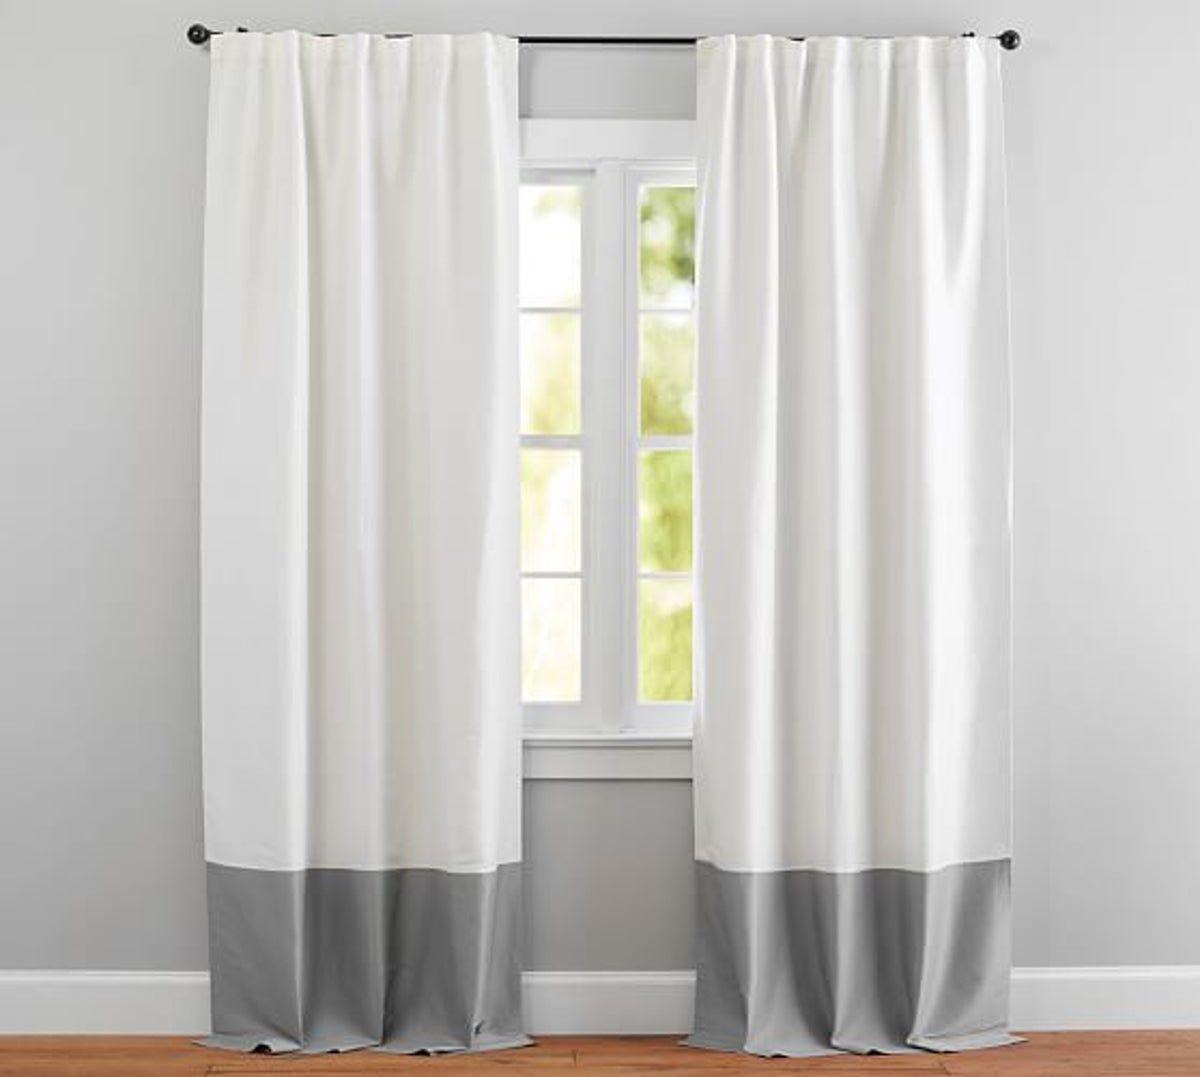 New Pottery Barn Linen Silk Drapes 96 Color Block Curtains Drapes Curtains Curtains